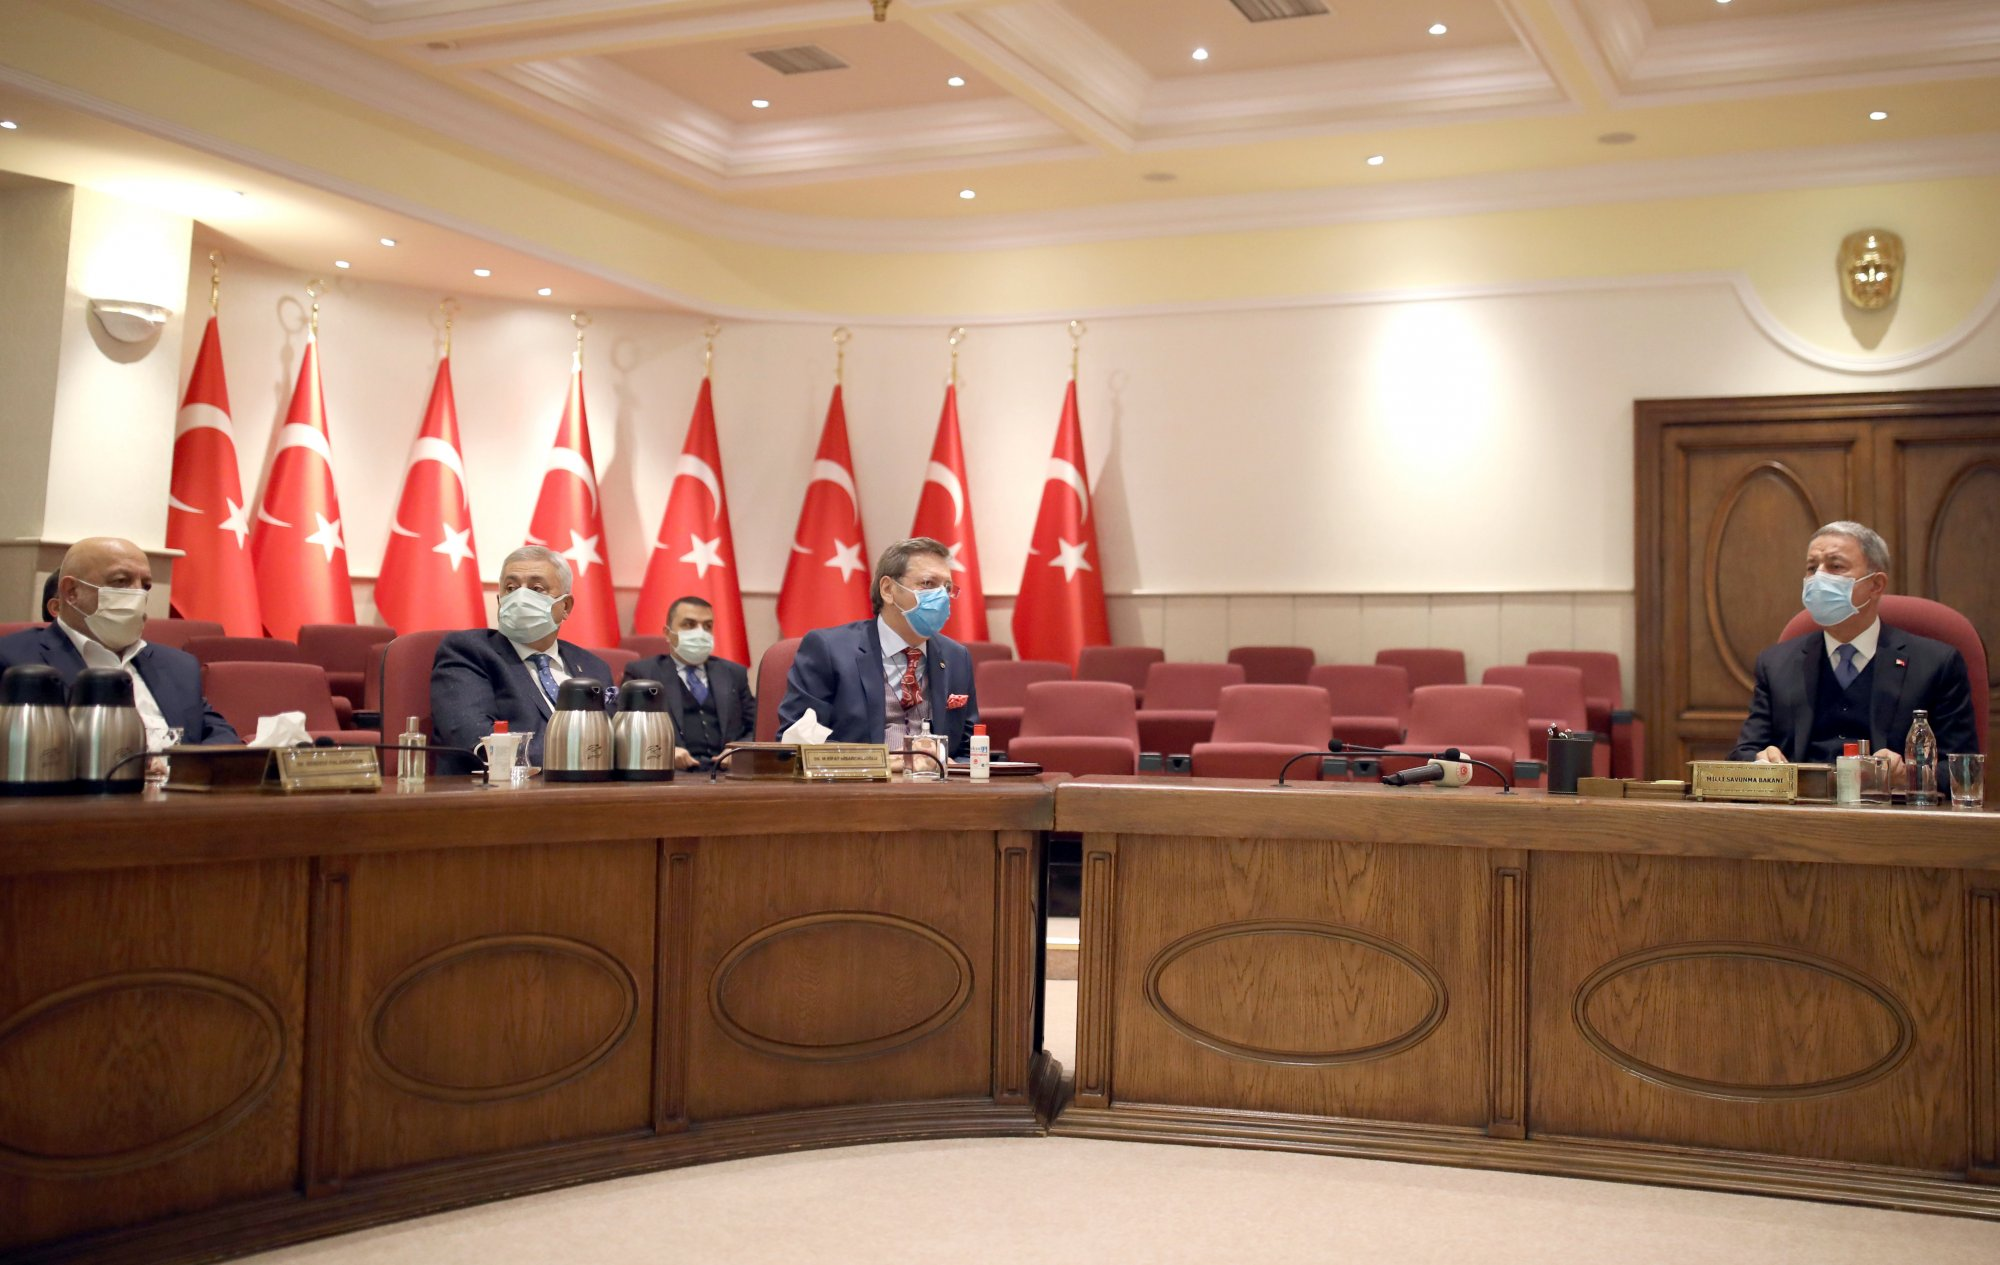 ARSLAN'DAN BAKAN AKAR'A DESTEK ZİYARETİ